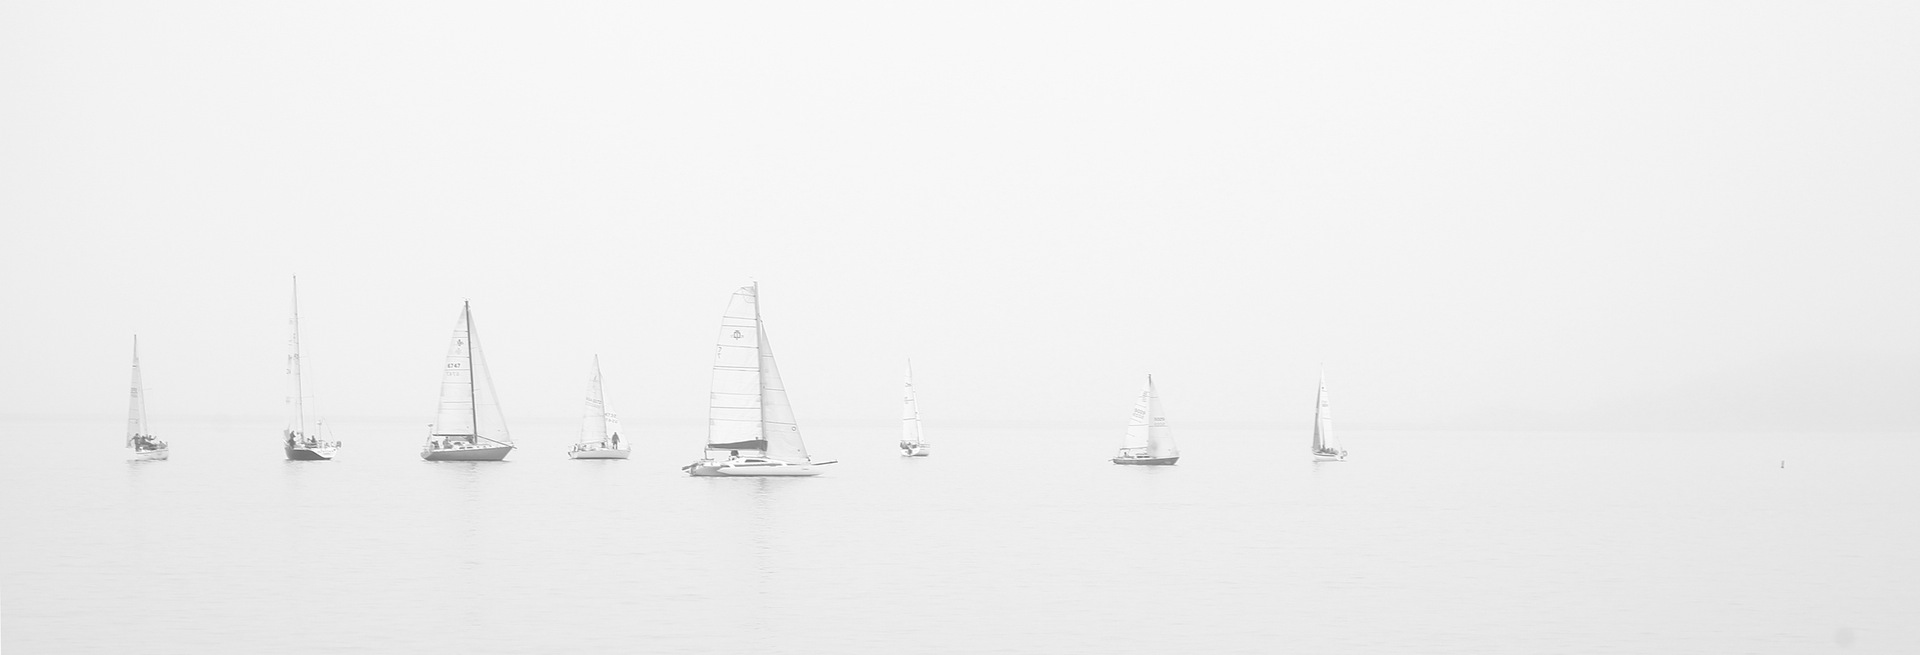 sea-black-and-white-ocean-boats.jpg